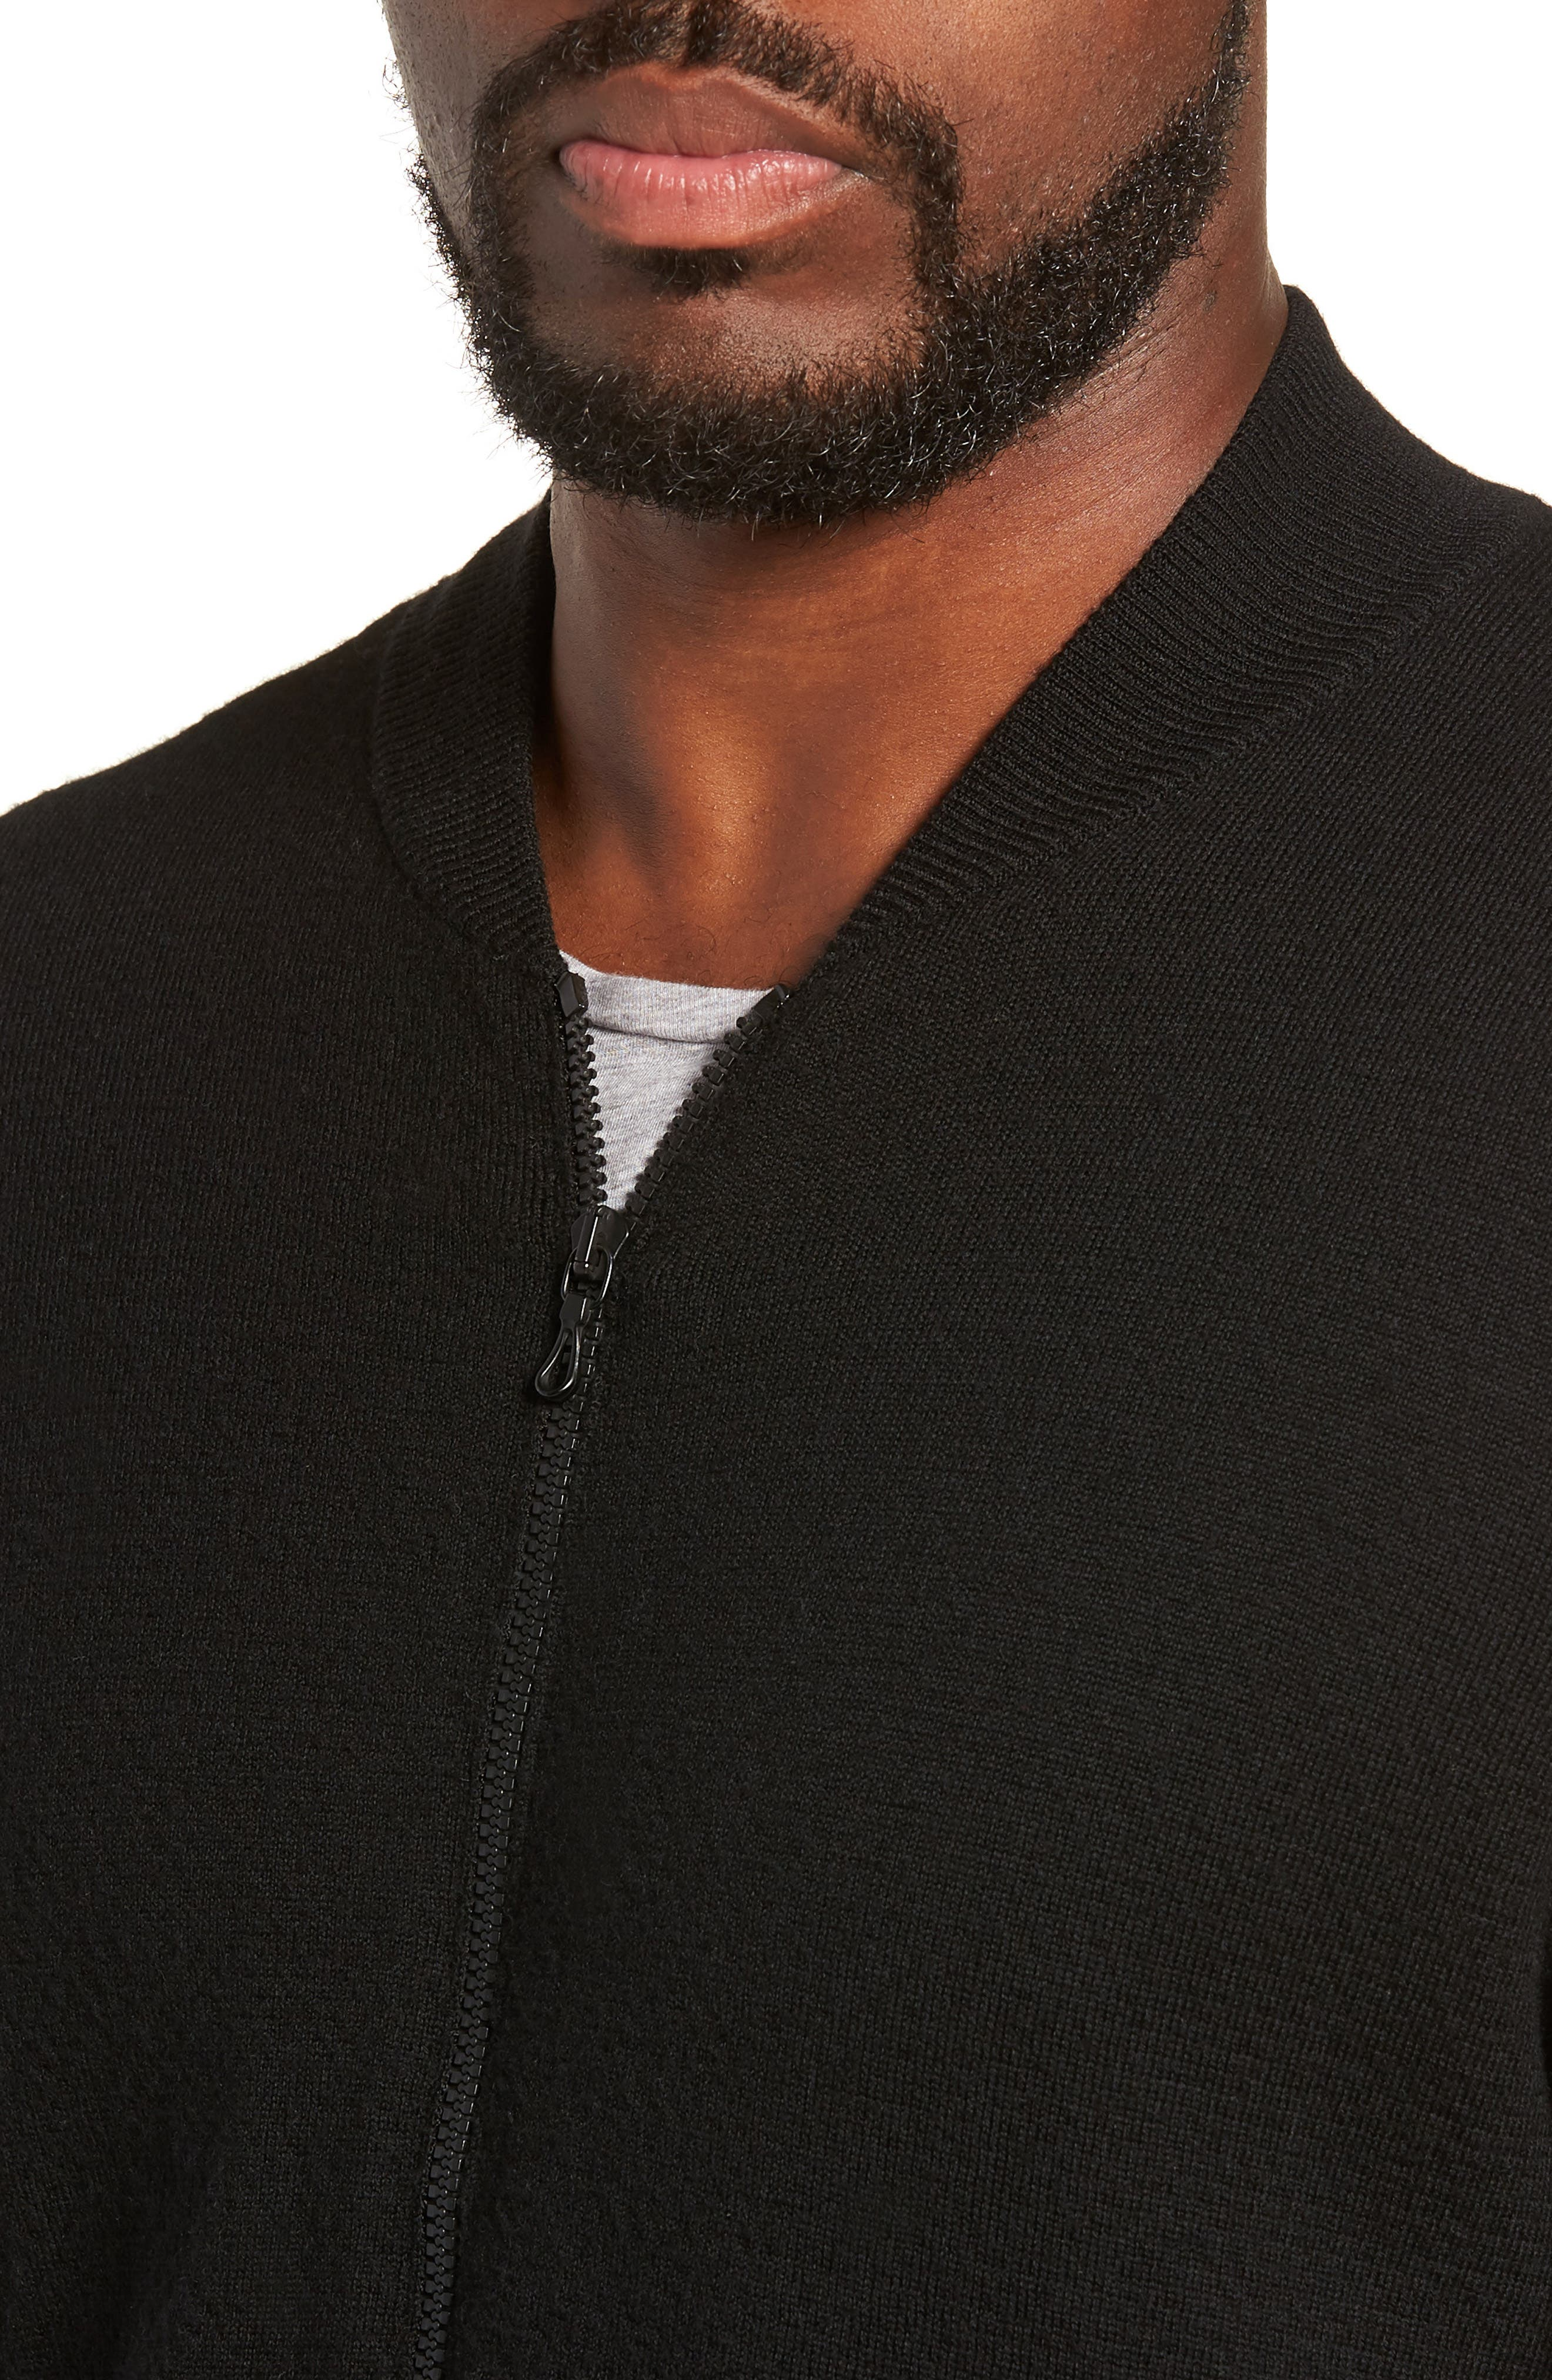 Orwell Slim Fit Wool Bomber Jacket,                             Alternate thumbnail 4, color,                             BLACK/ BLACK